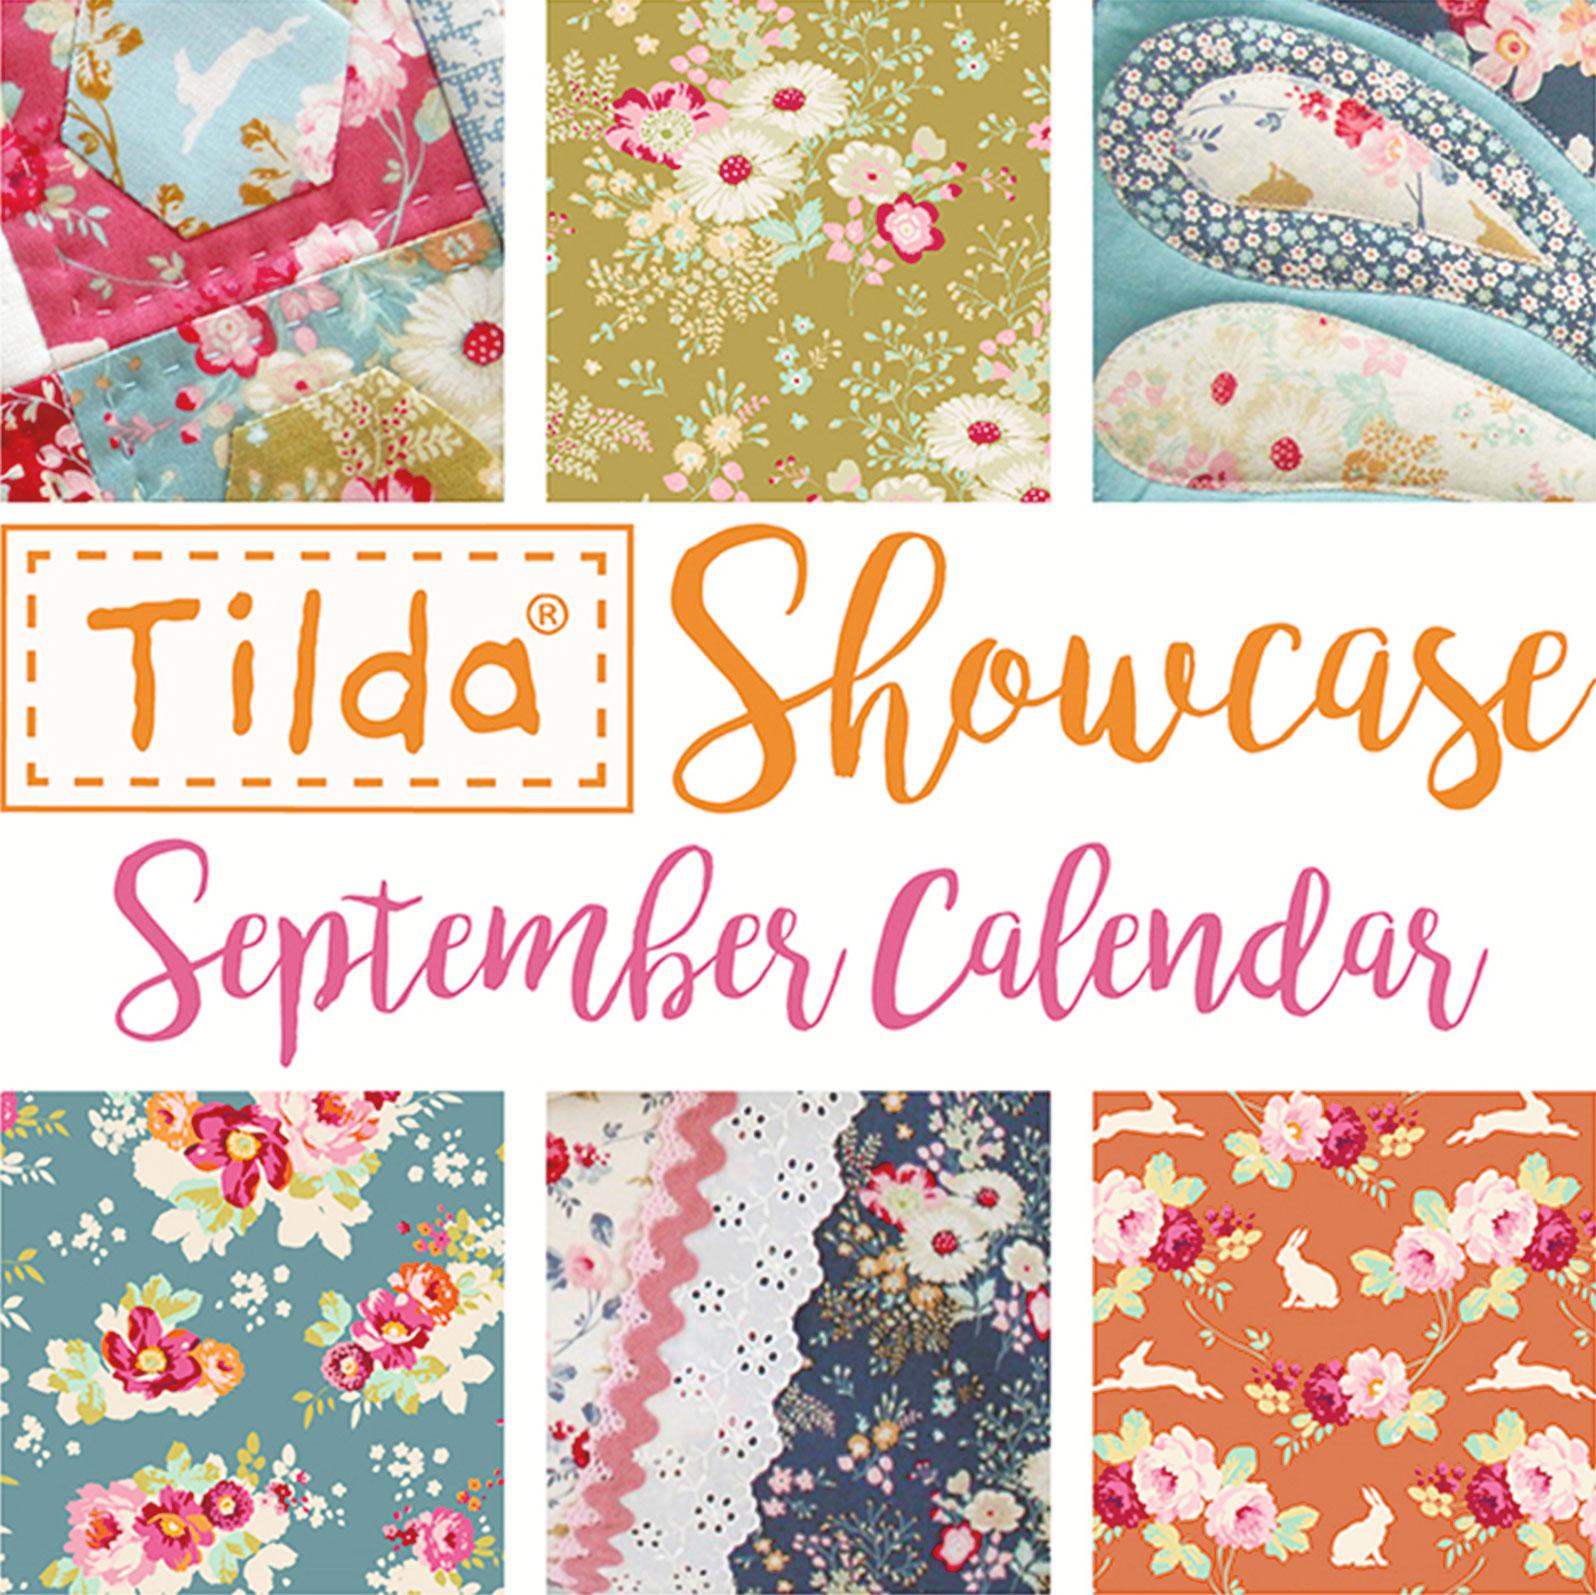 Tilda-Showcase